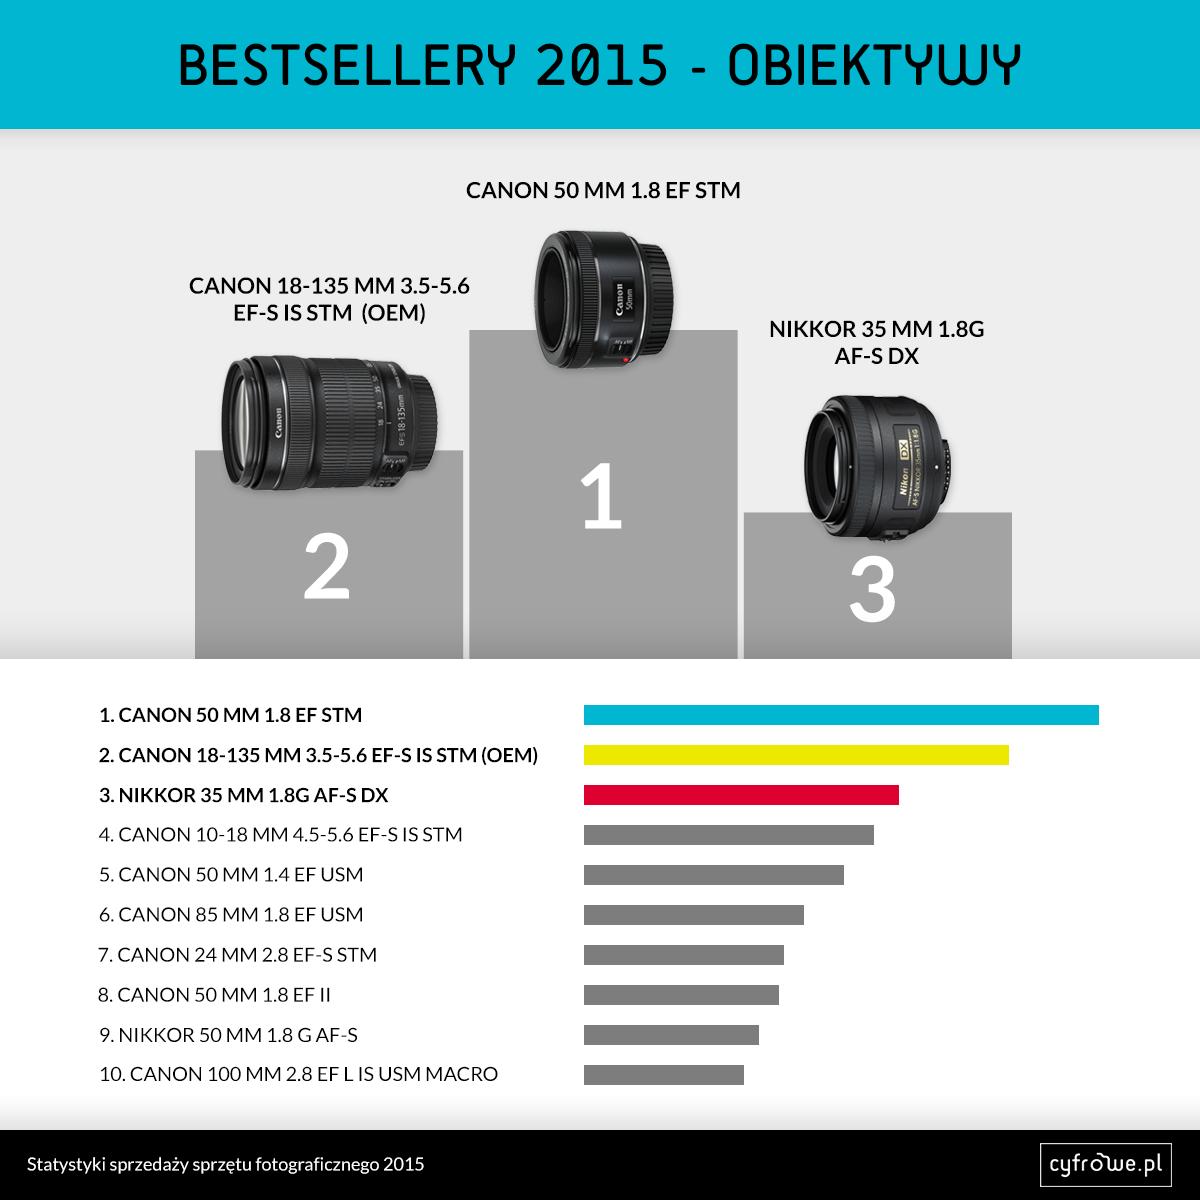 obiektywy bestsellery 2015